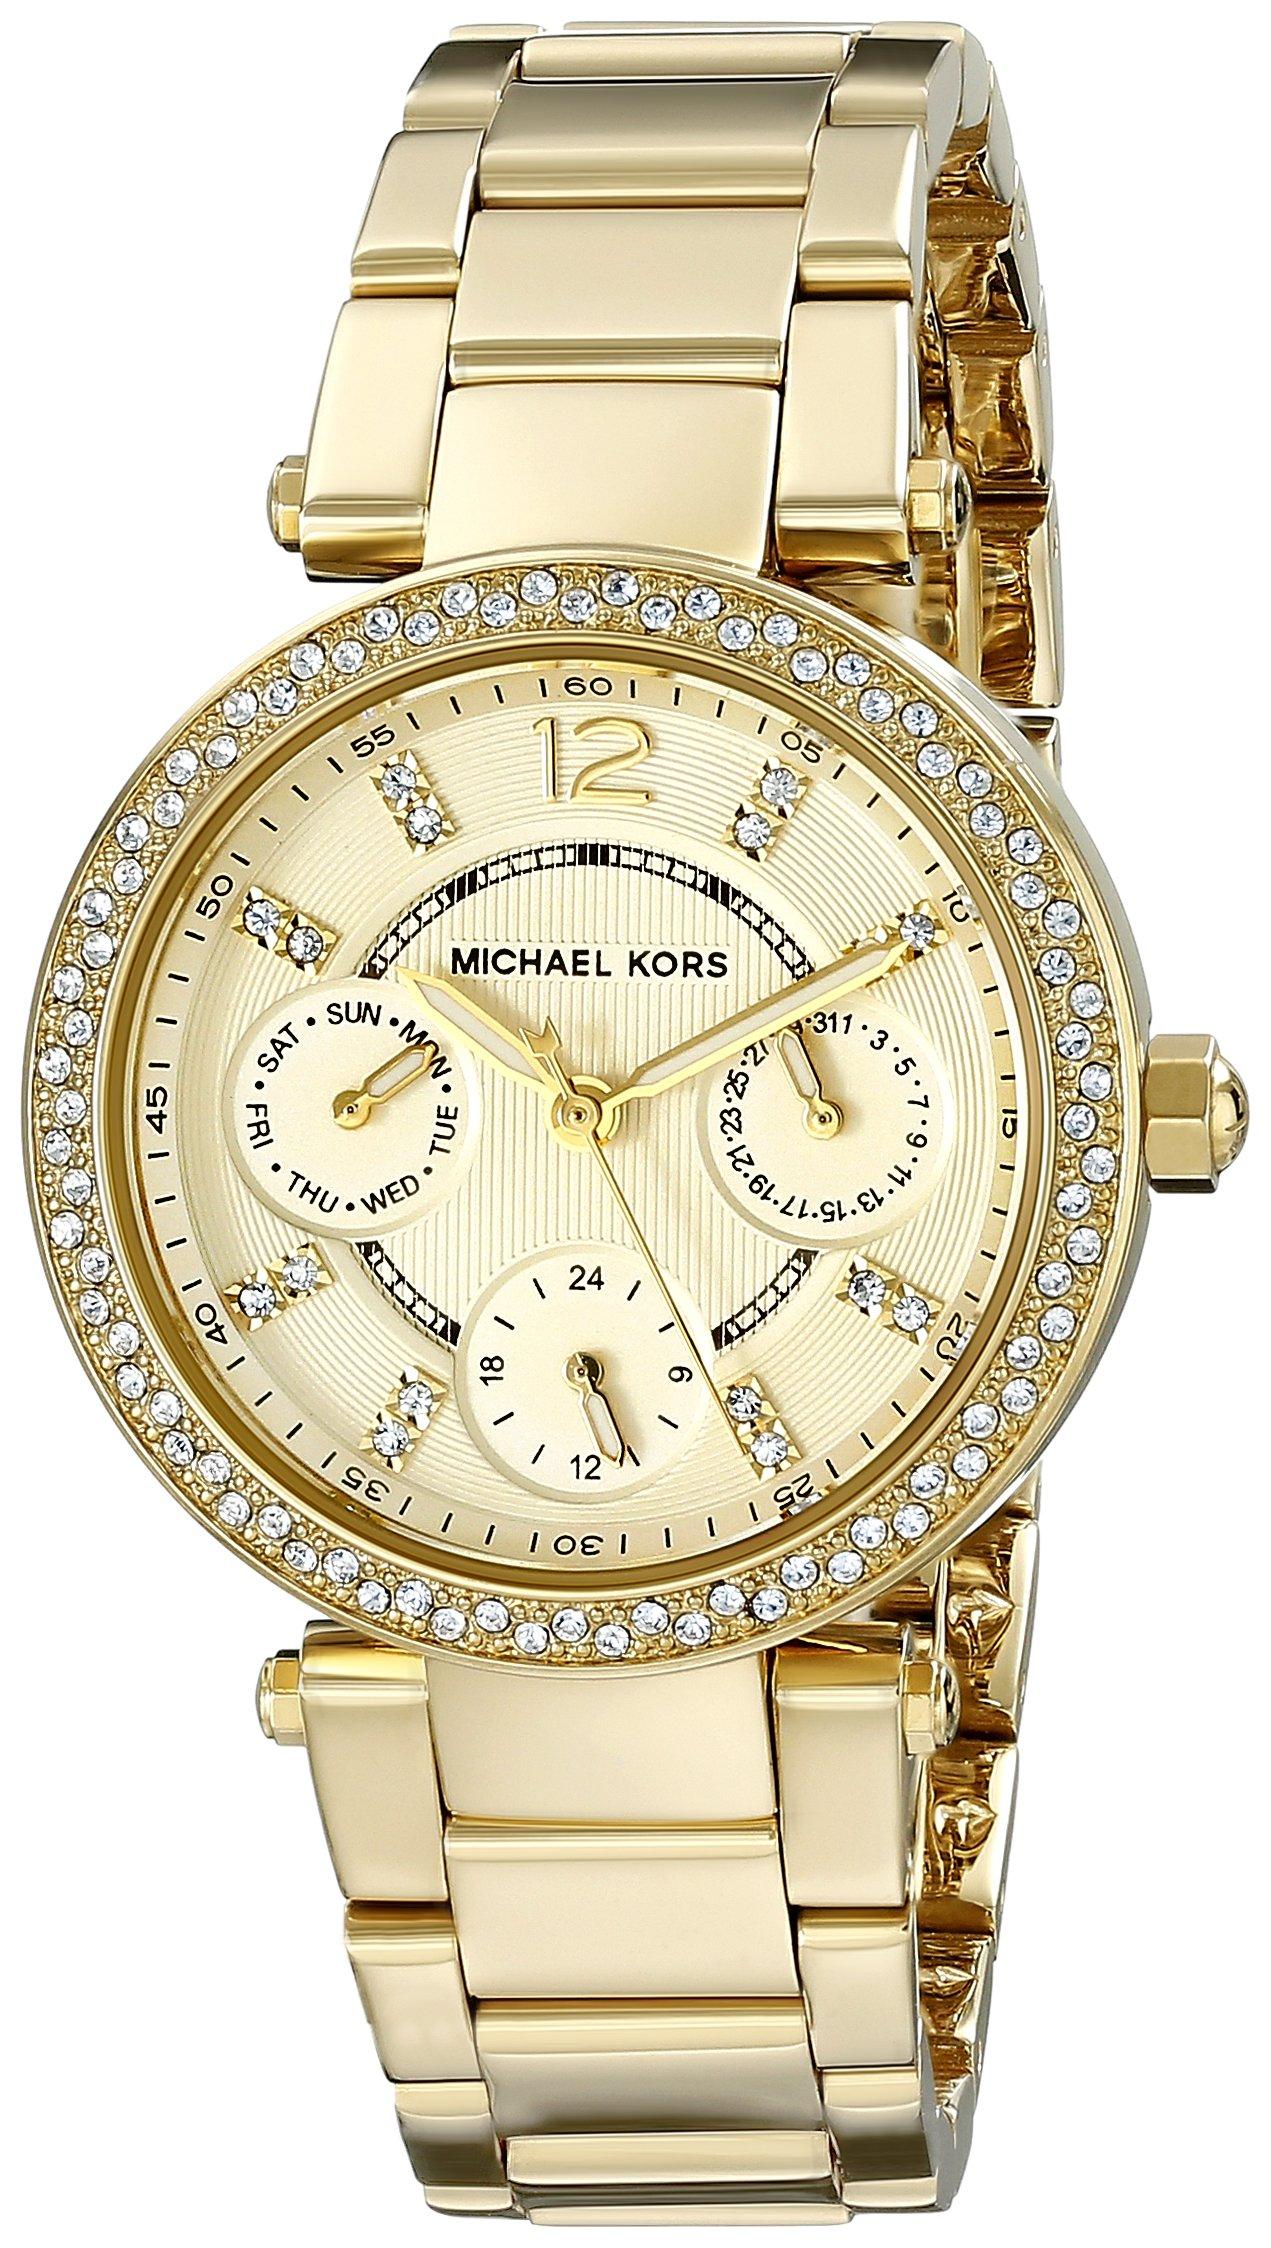 Michael Kors Women's Parker Gold-Tone Watch MK6056